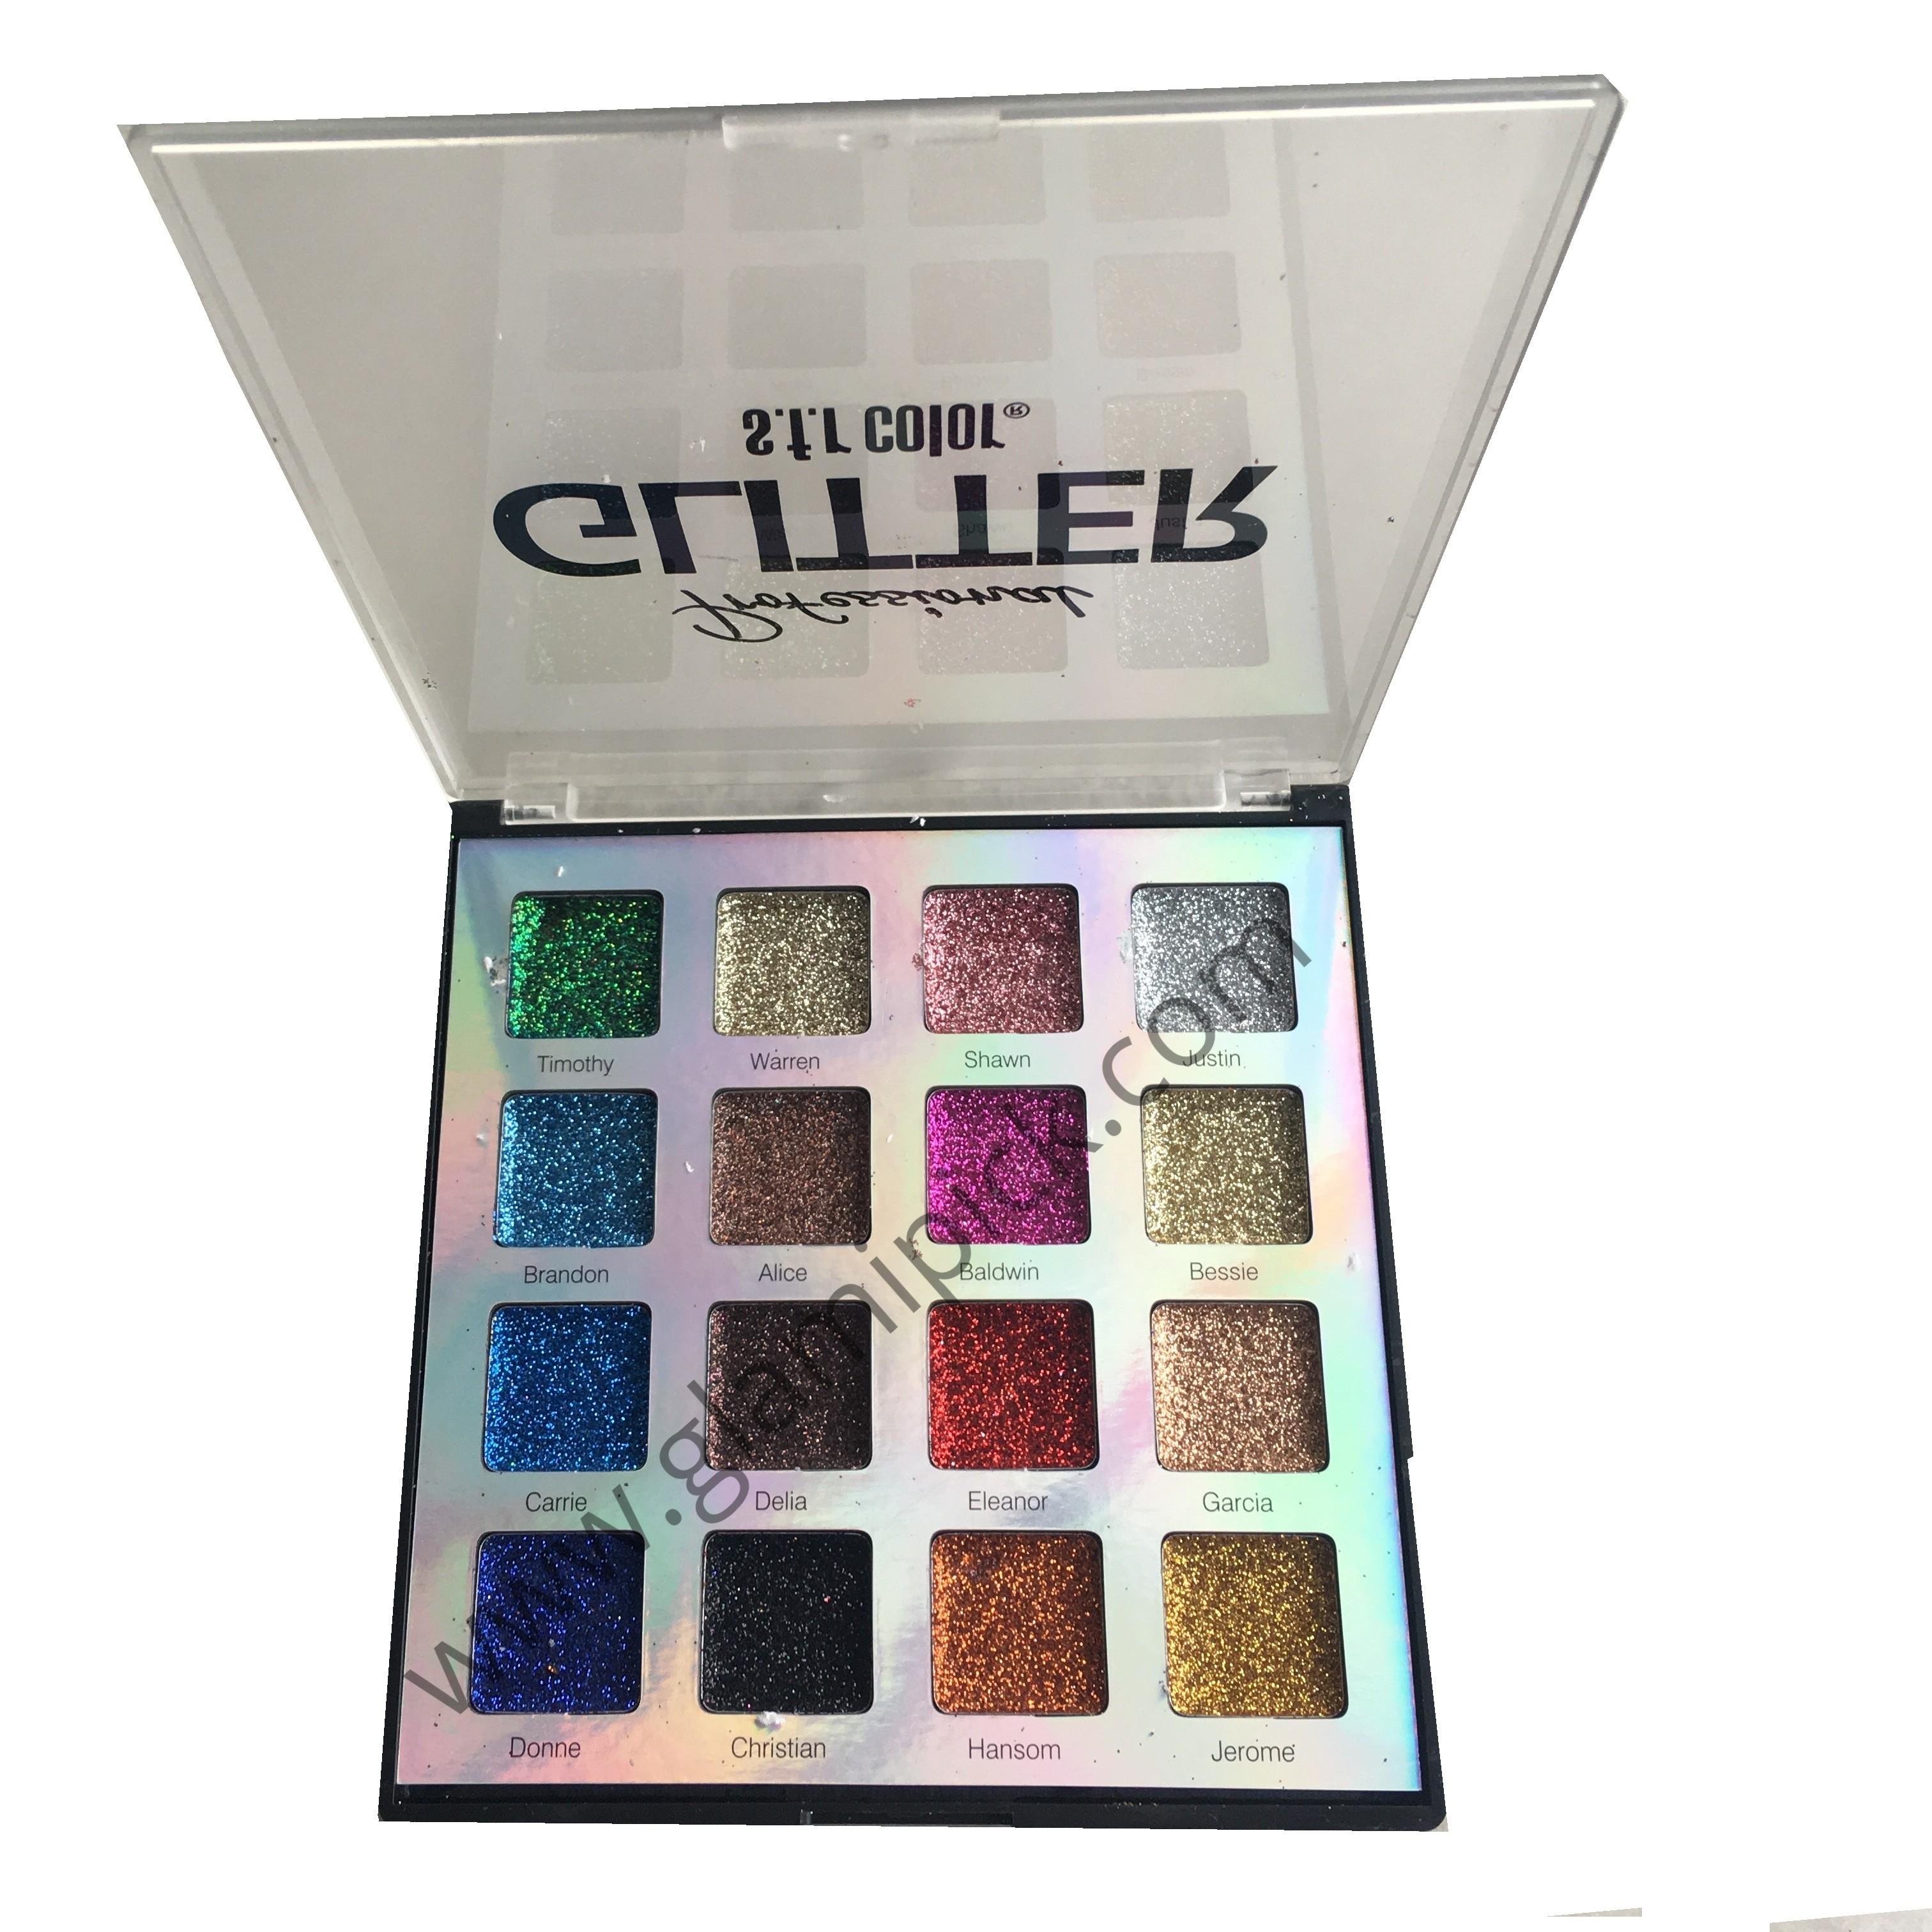 S.F.R proffesional Glitter